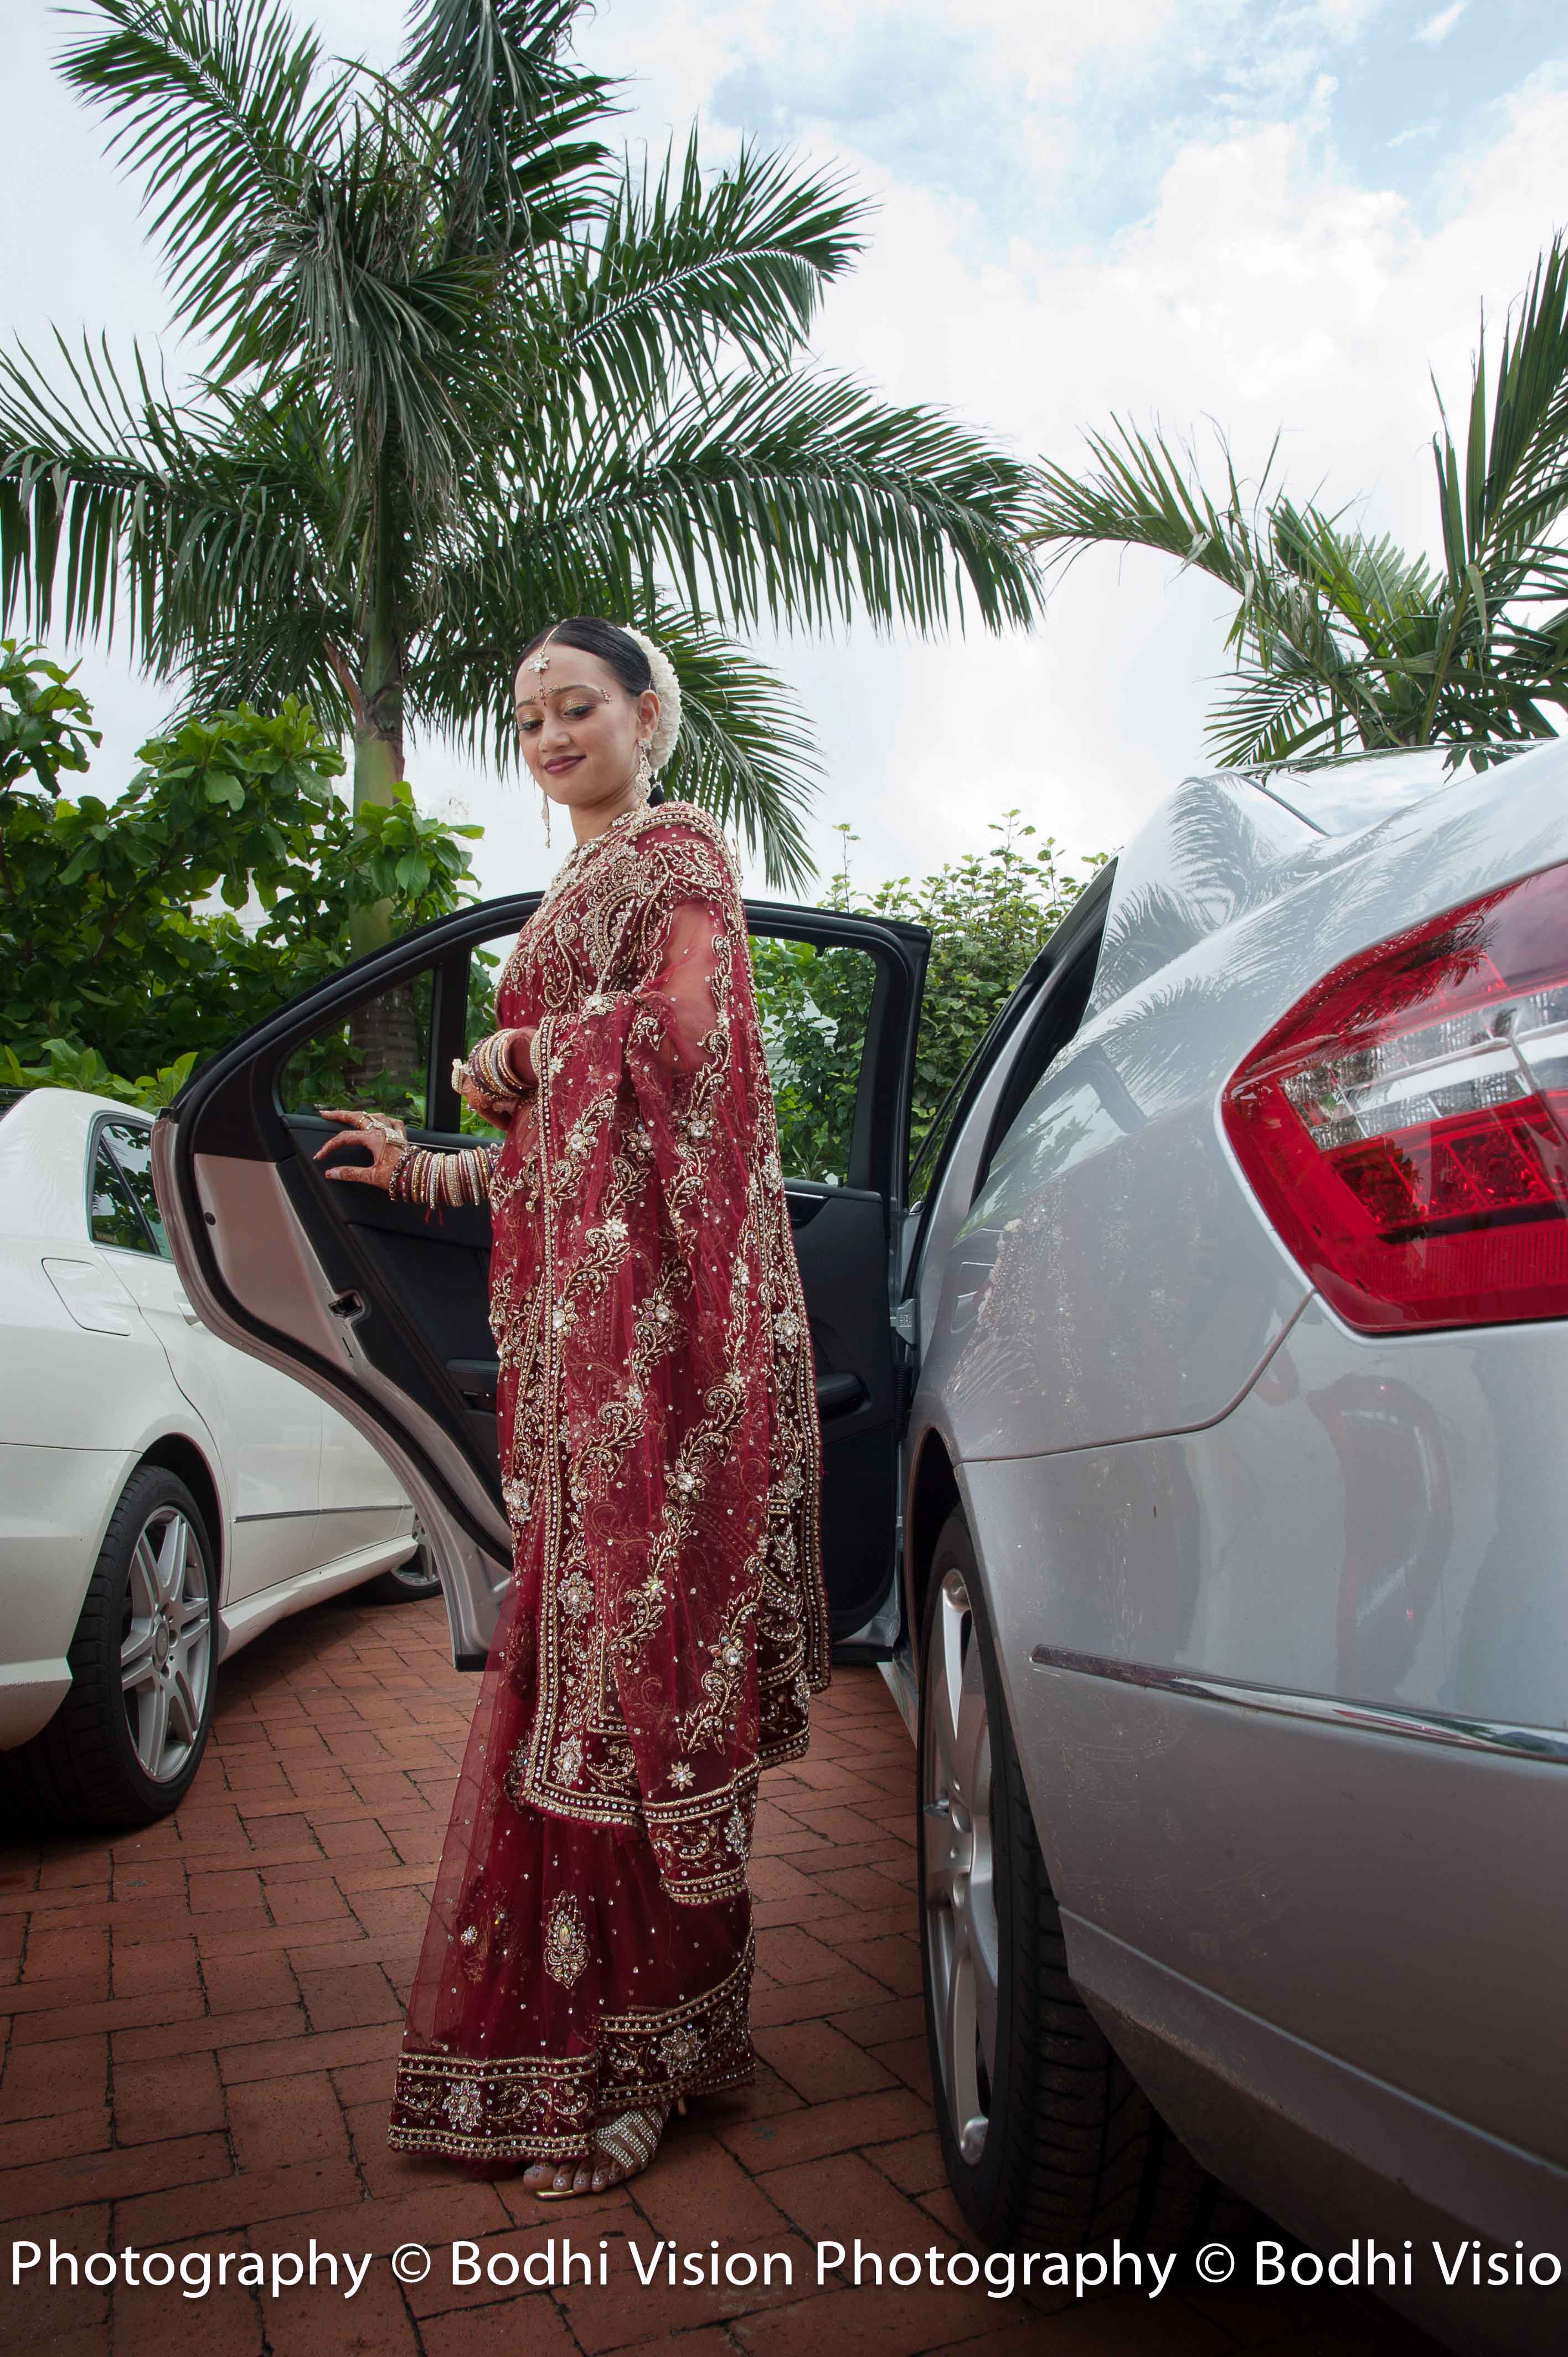 Dhashogran Sunisha S Tamil Wedding Umgeni Road Temple Hall